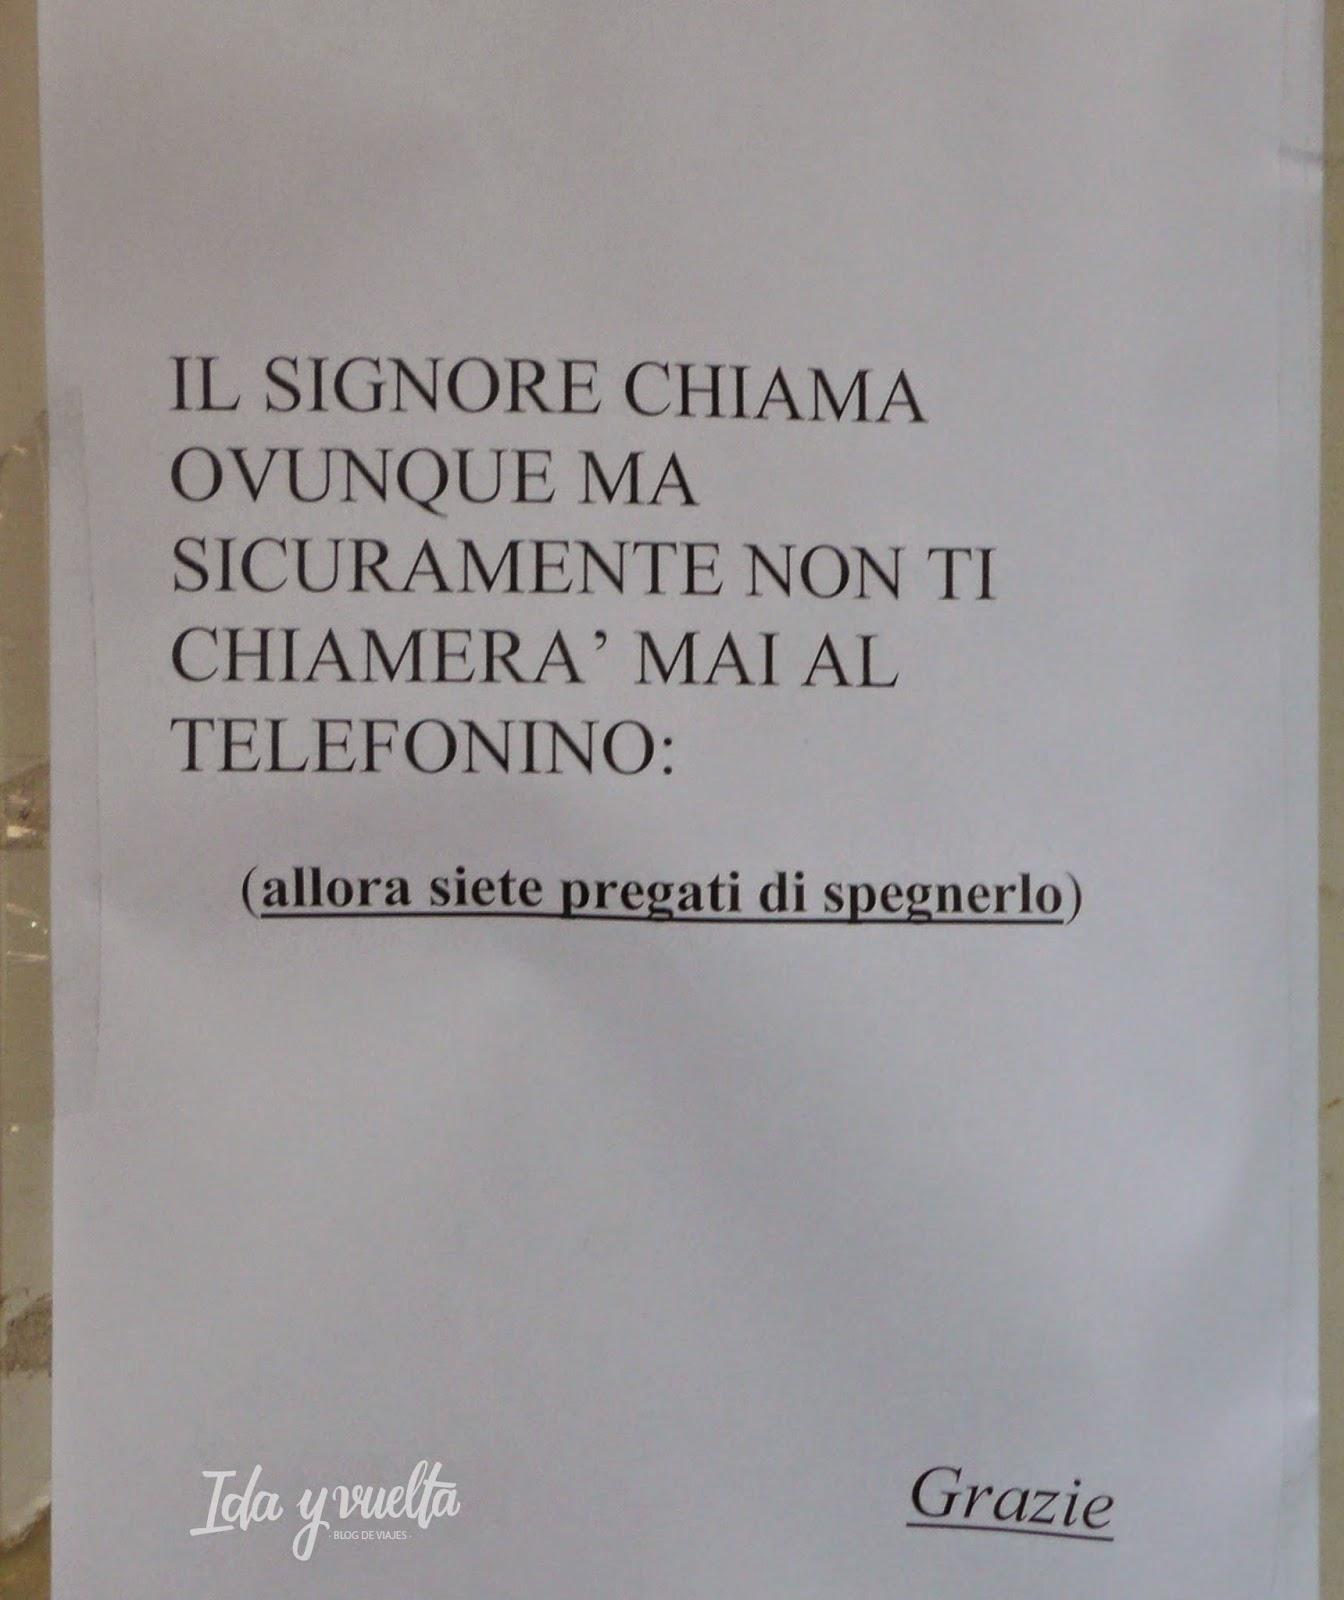 Cartel en una iglesia